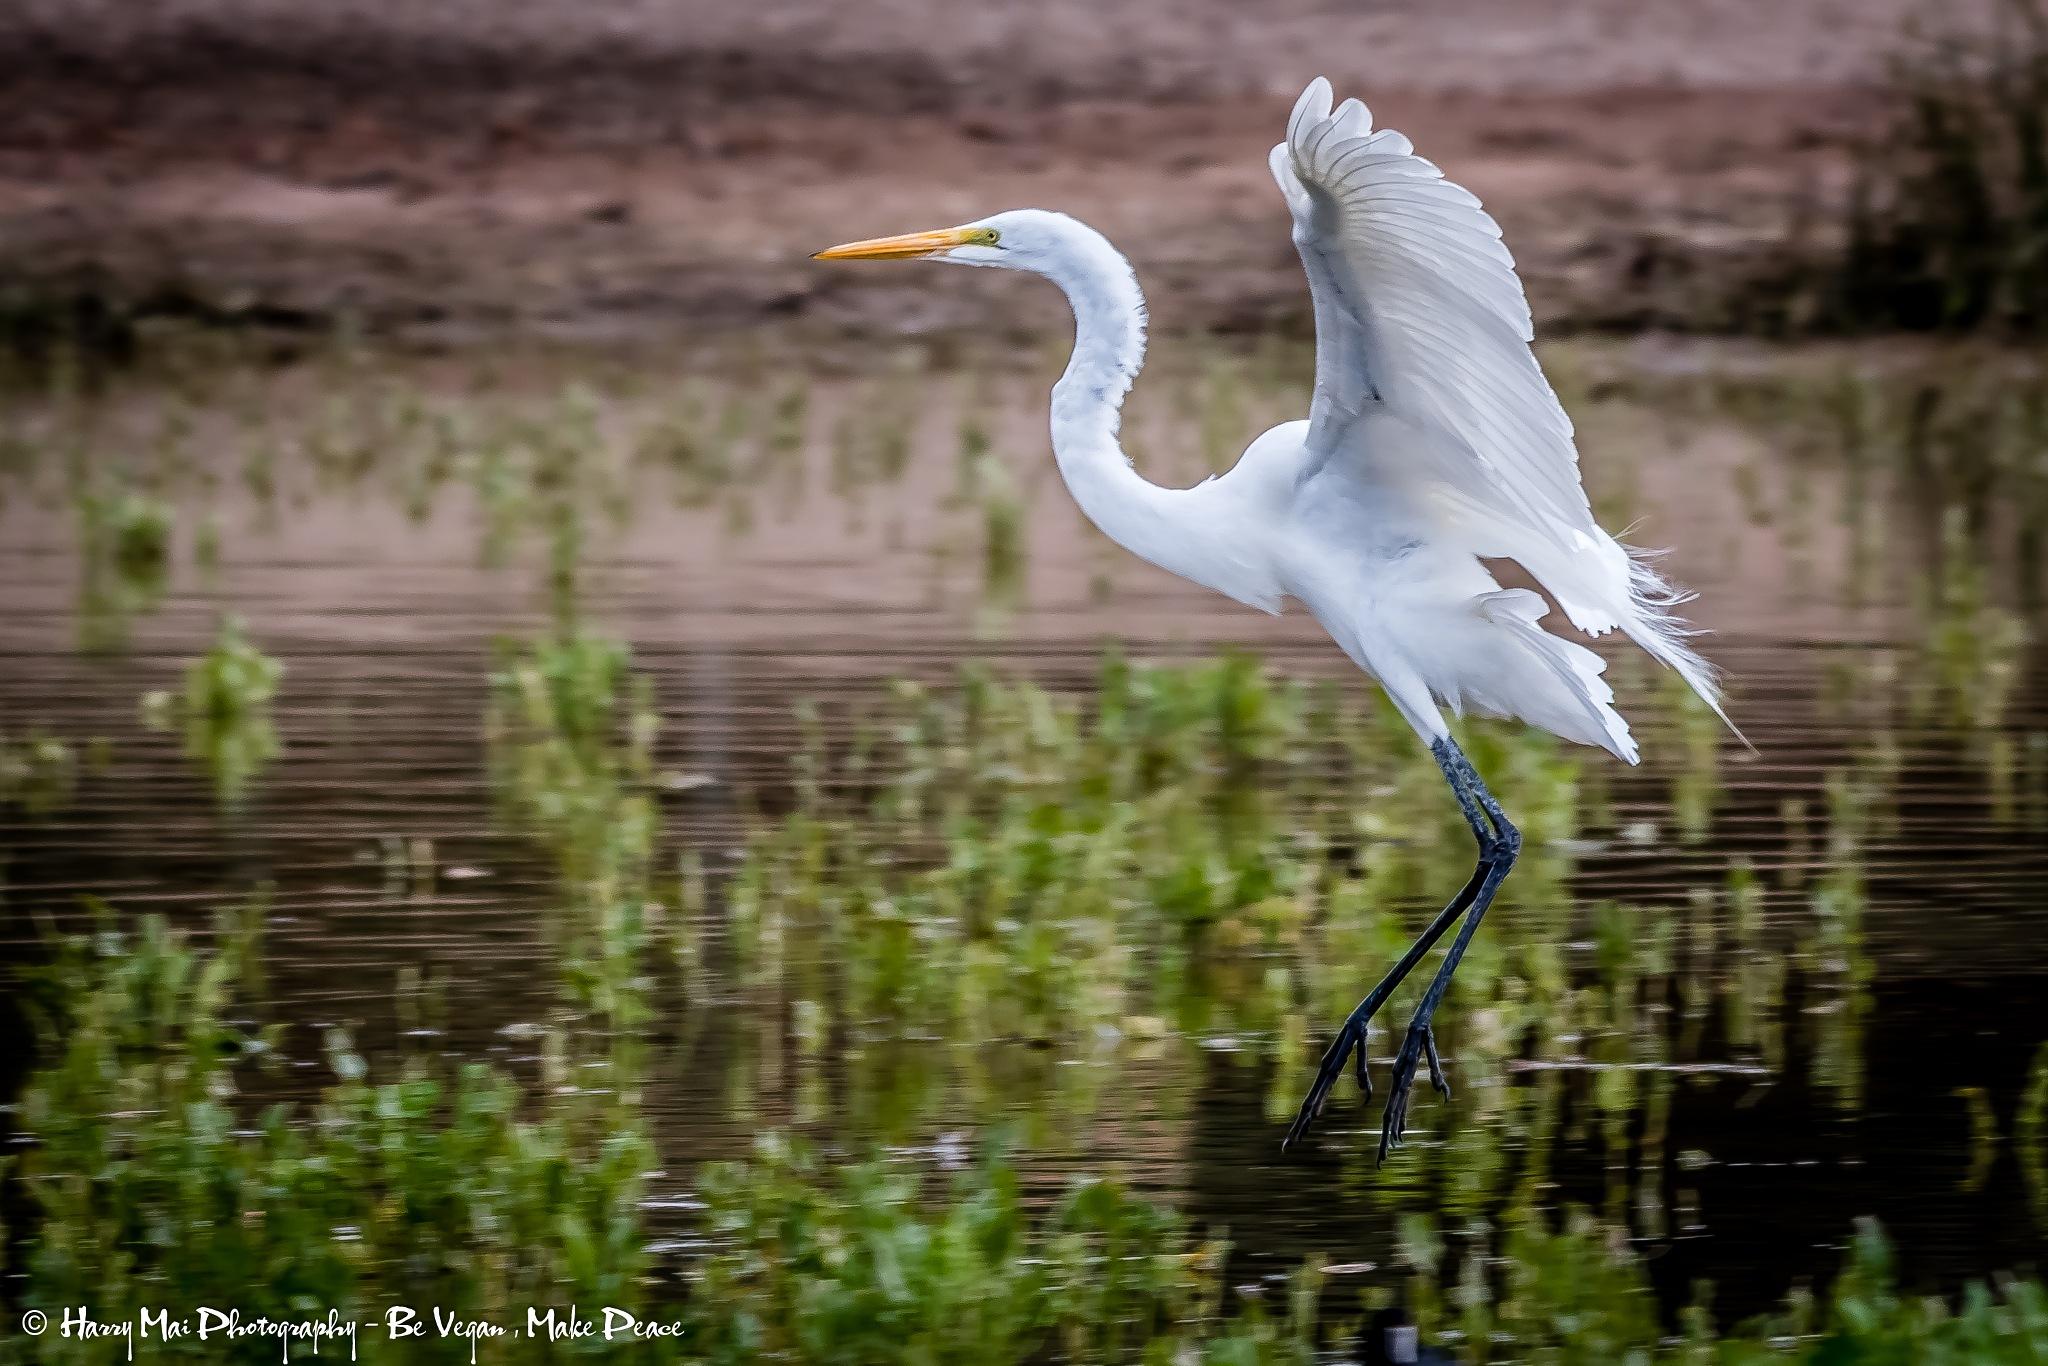 Bird Landing by Harry Mai